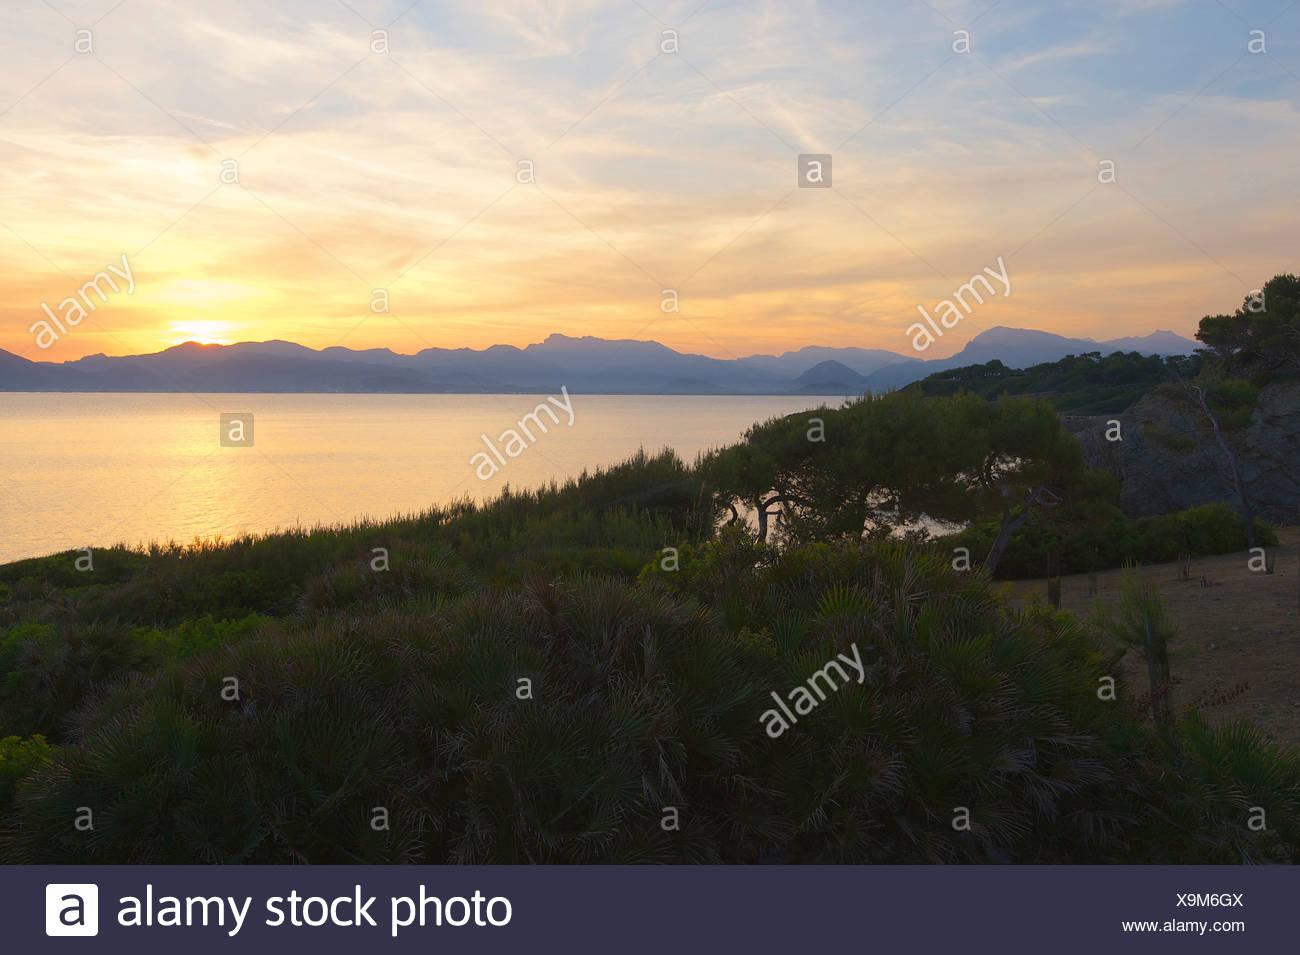 Balearic Islands, Majorca, Mallorca, Spain, Europe, outside, Alcudia, coast, seashore, coasts, seashores, coastal scenery, coast - Stock Image